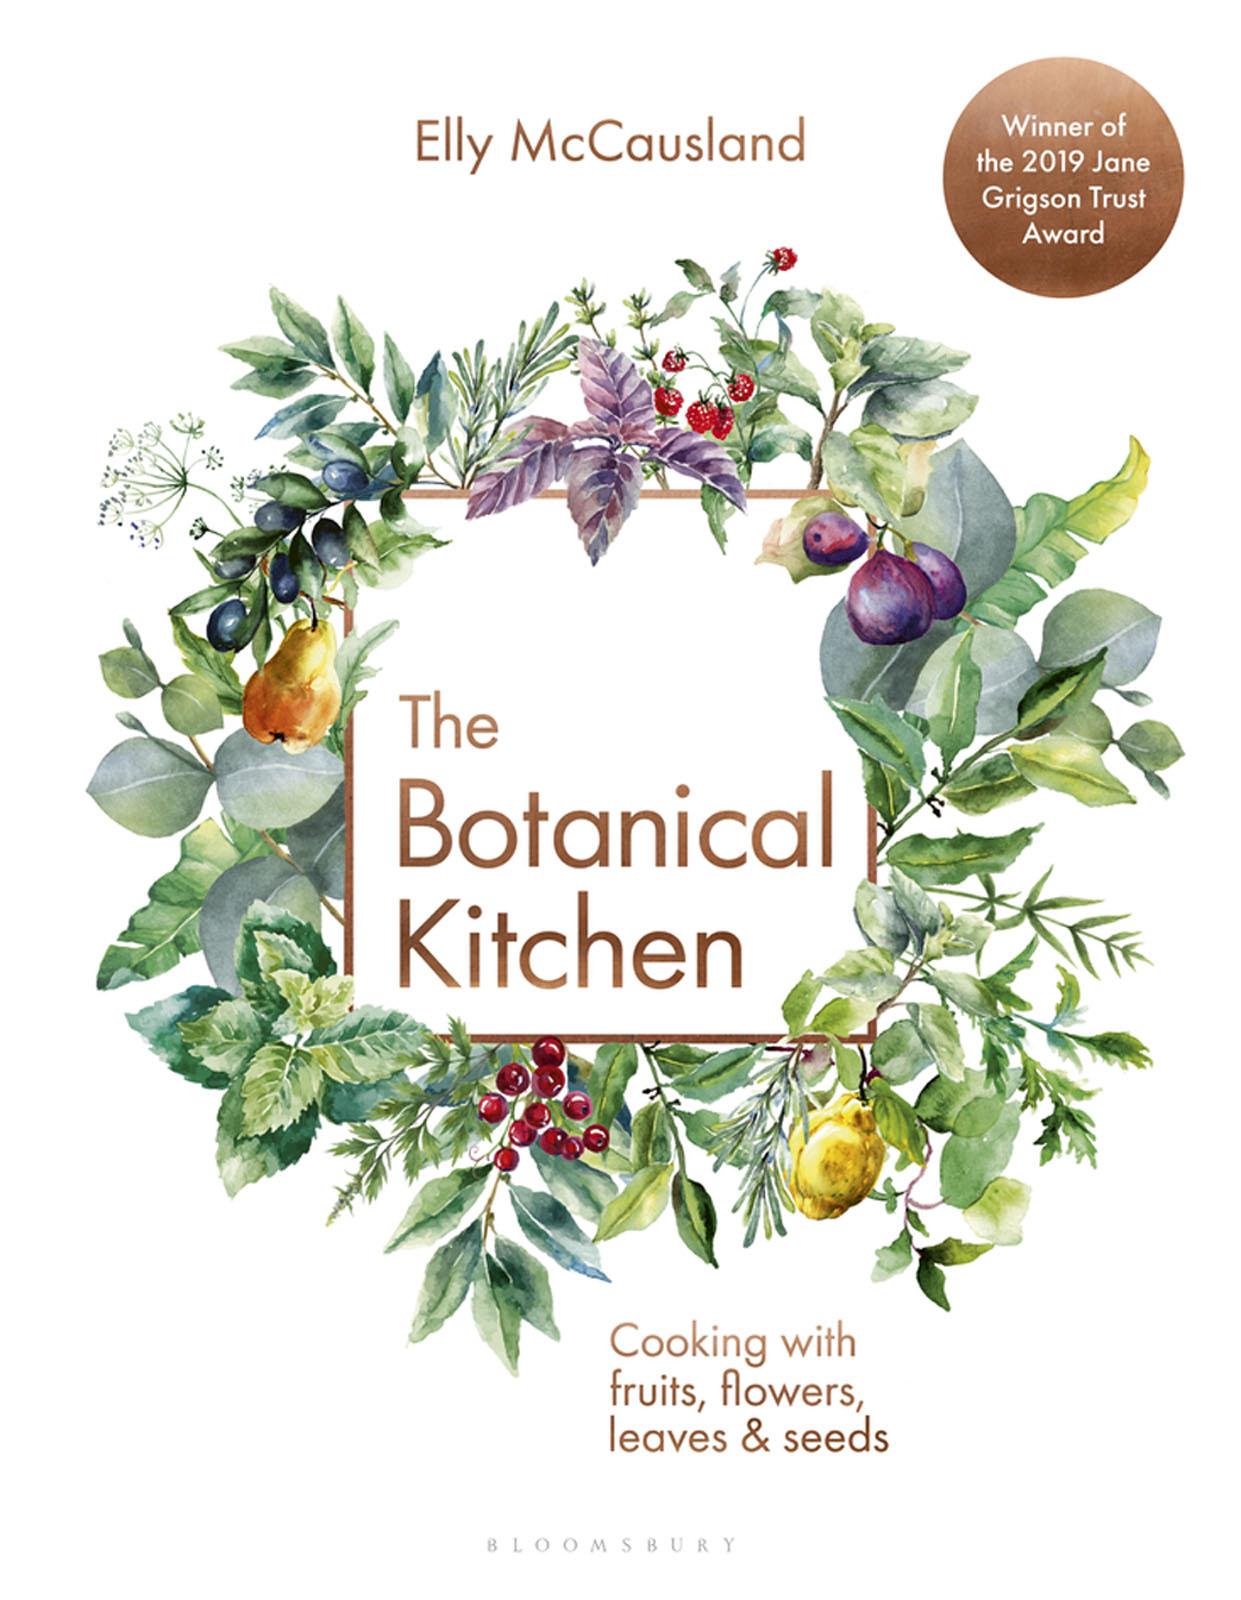 Elly McCausland's The Botanical Kitchen - book jacket